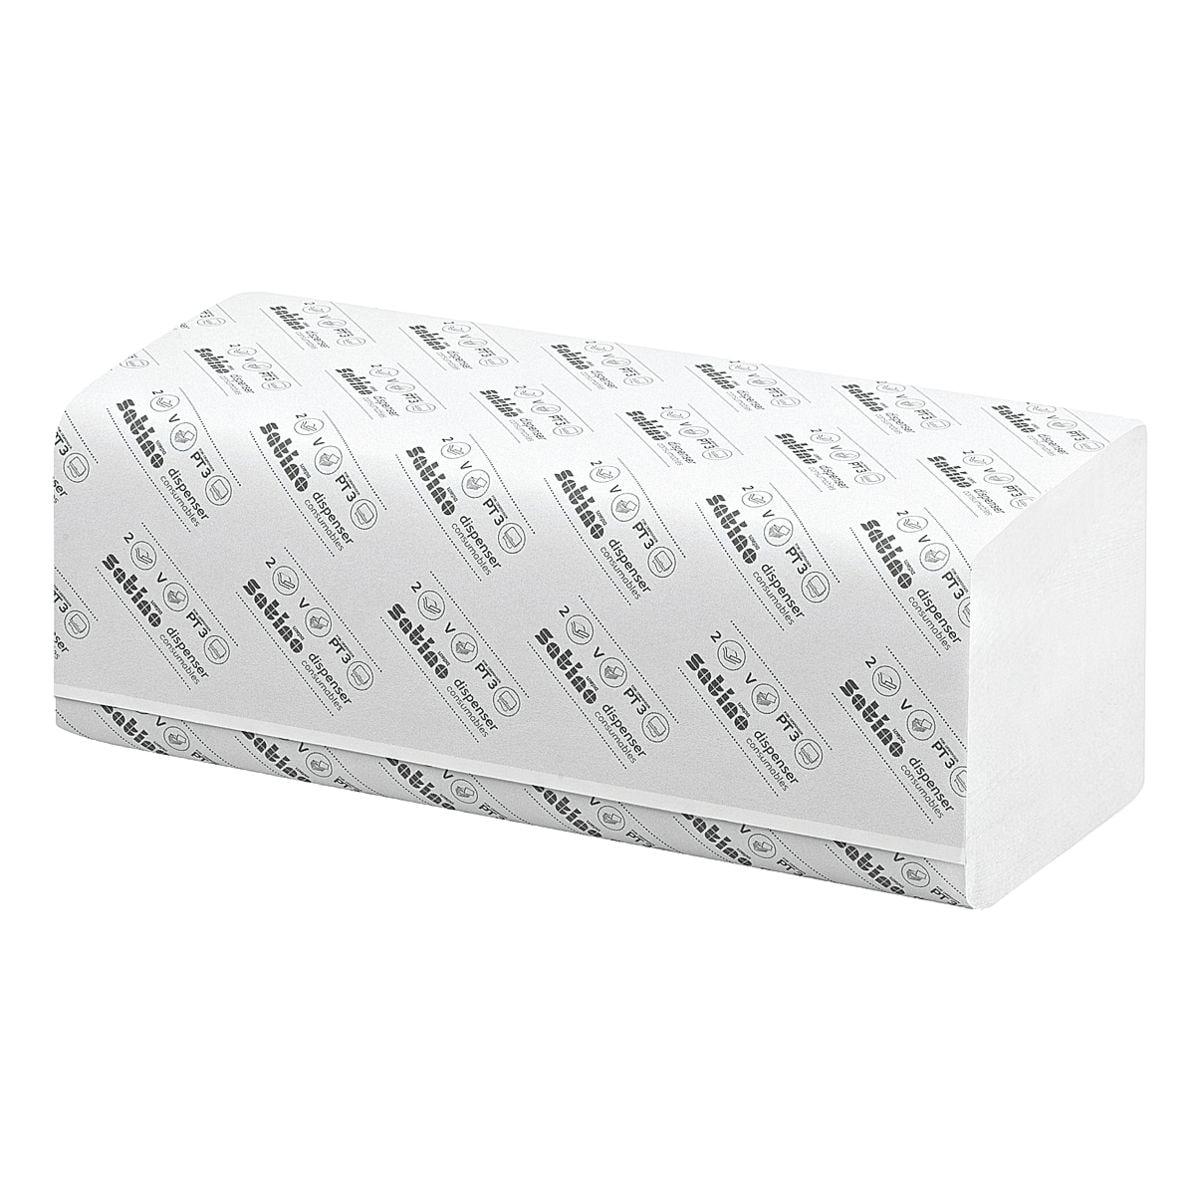 Papierhandtücher Satino SMART Wepa Smart 2-lagig, hochweiß, 24 cm x 23 cm aus Recyclingpapier mit Z-Falzung - 4000 Blatt gesamt